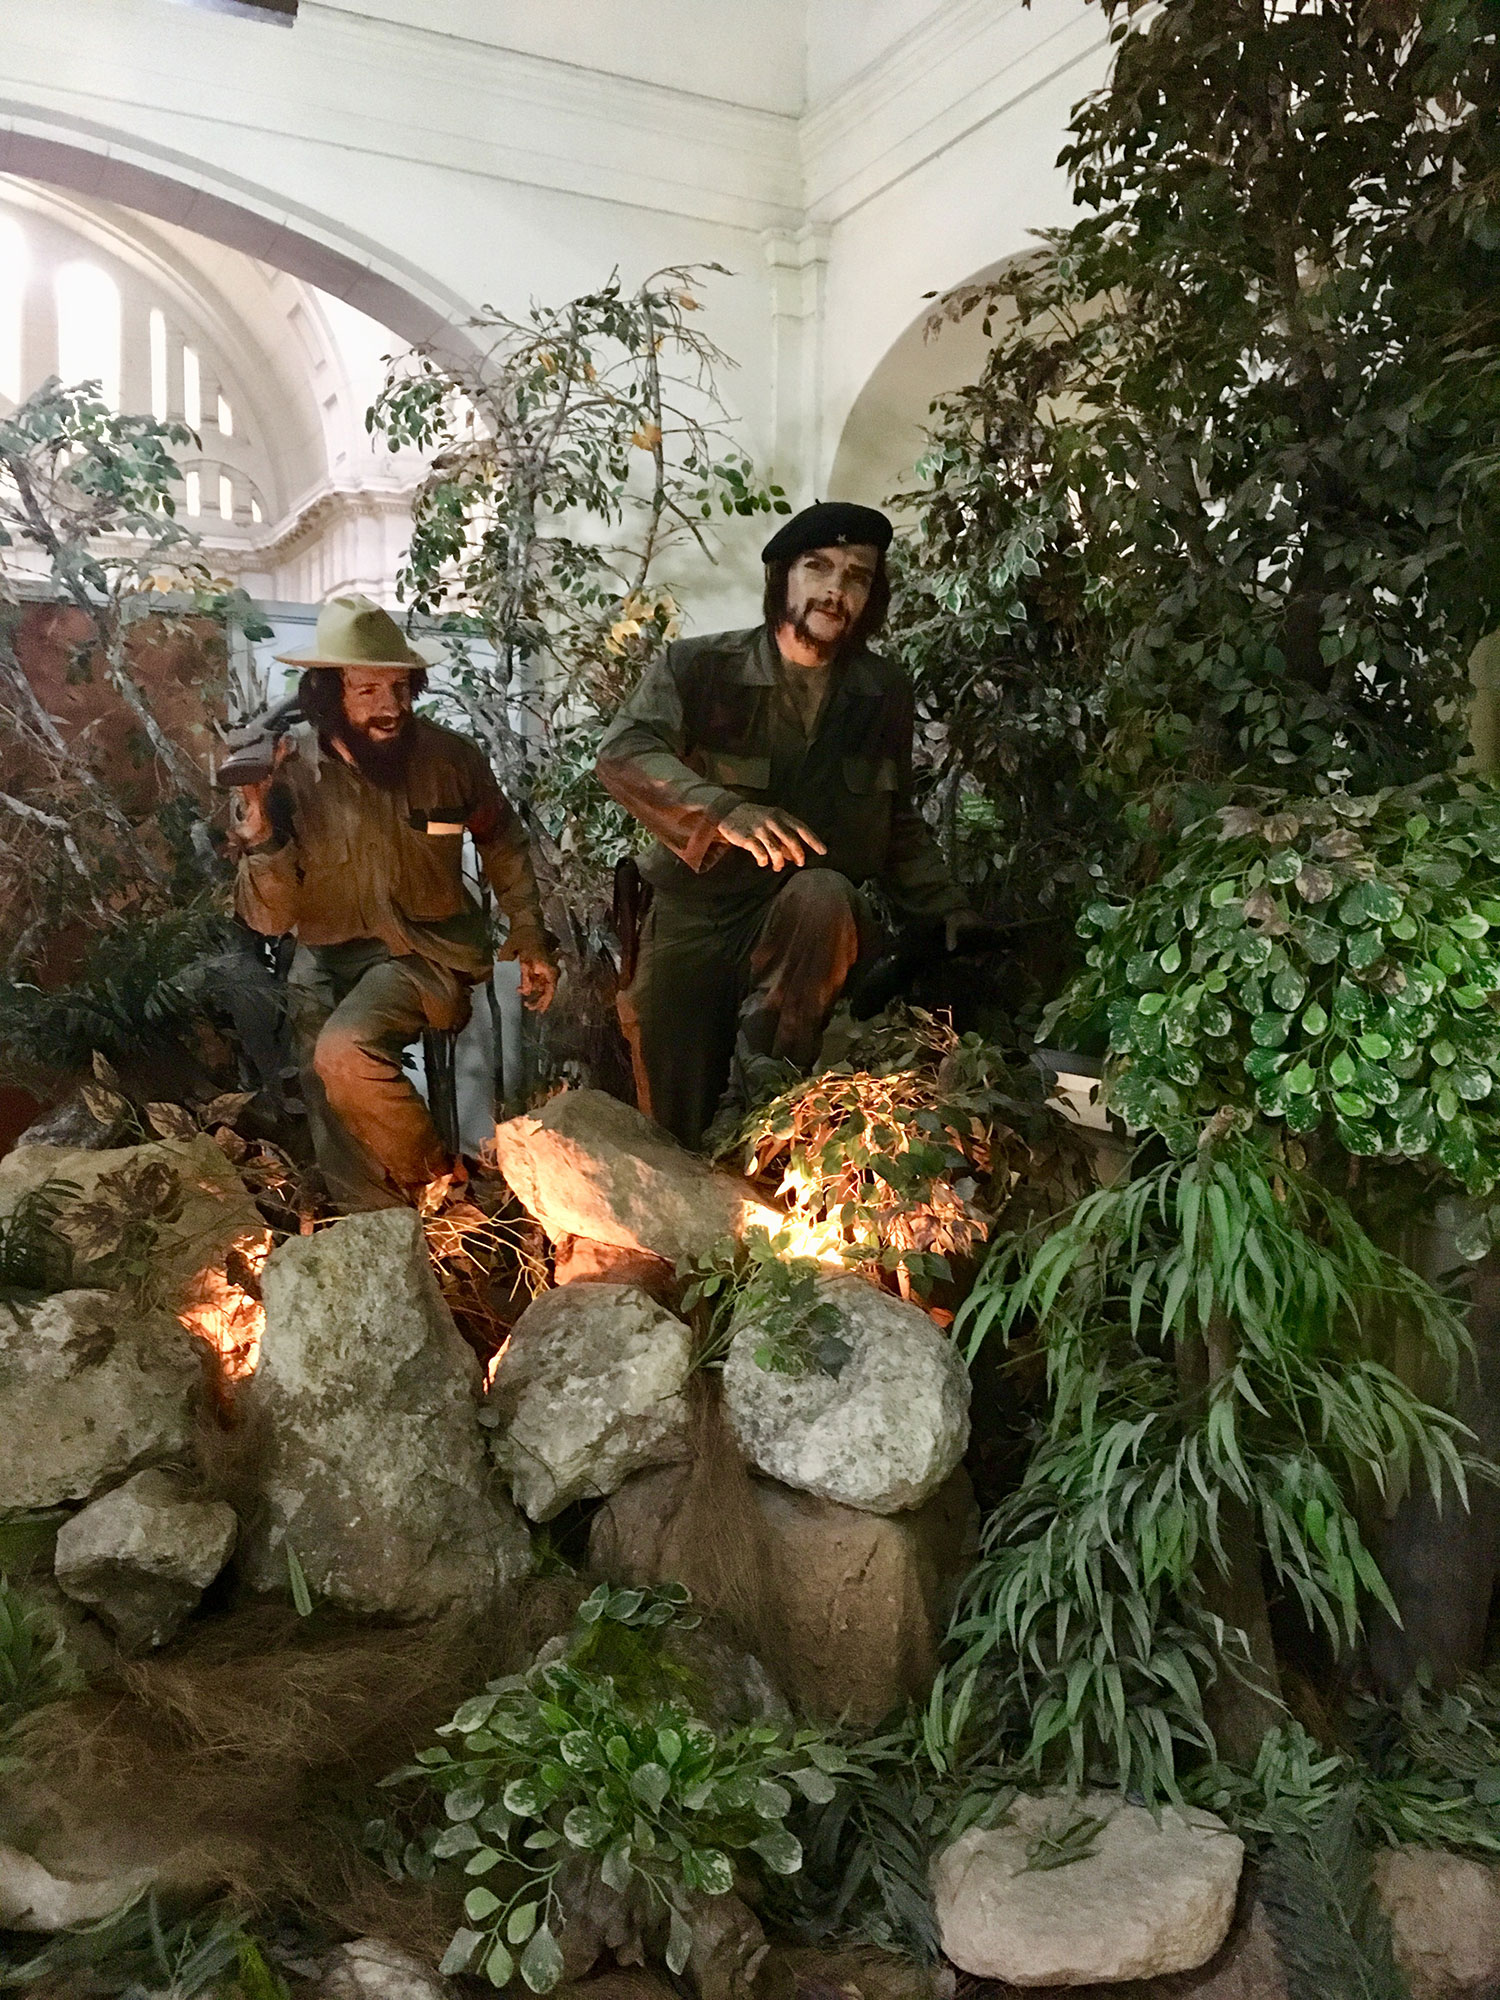 Hammocks_and_Ruins_What_to_Do_Cuba_Havana_island_museum_of_revolution_20.jpg